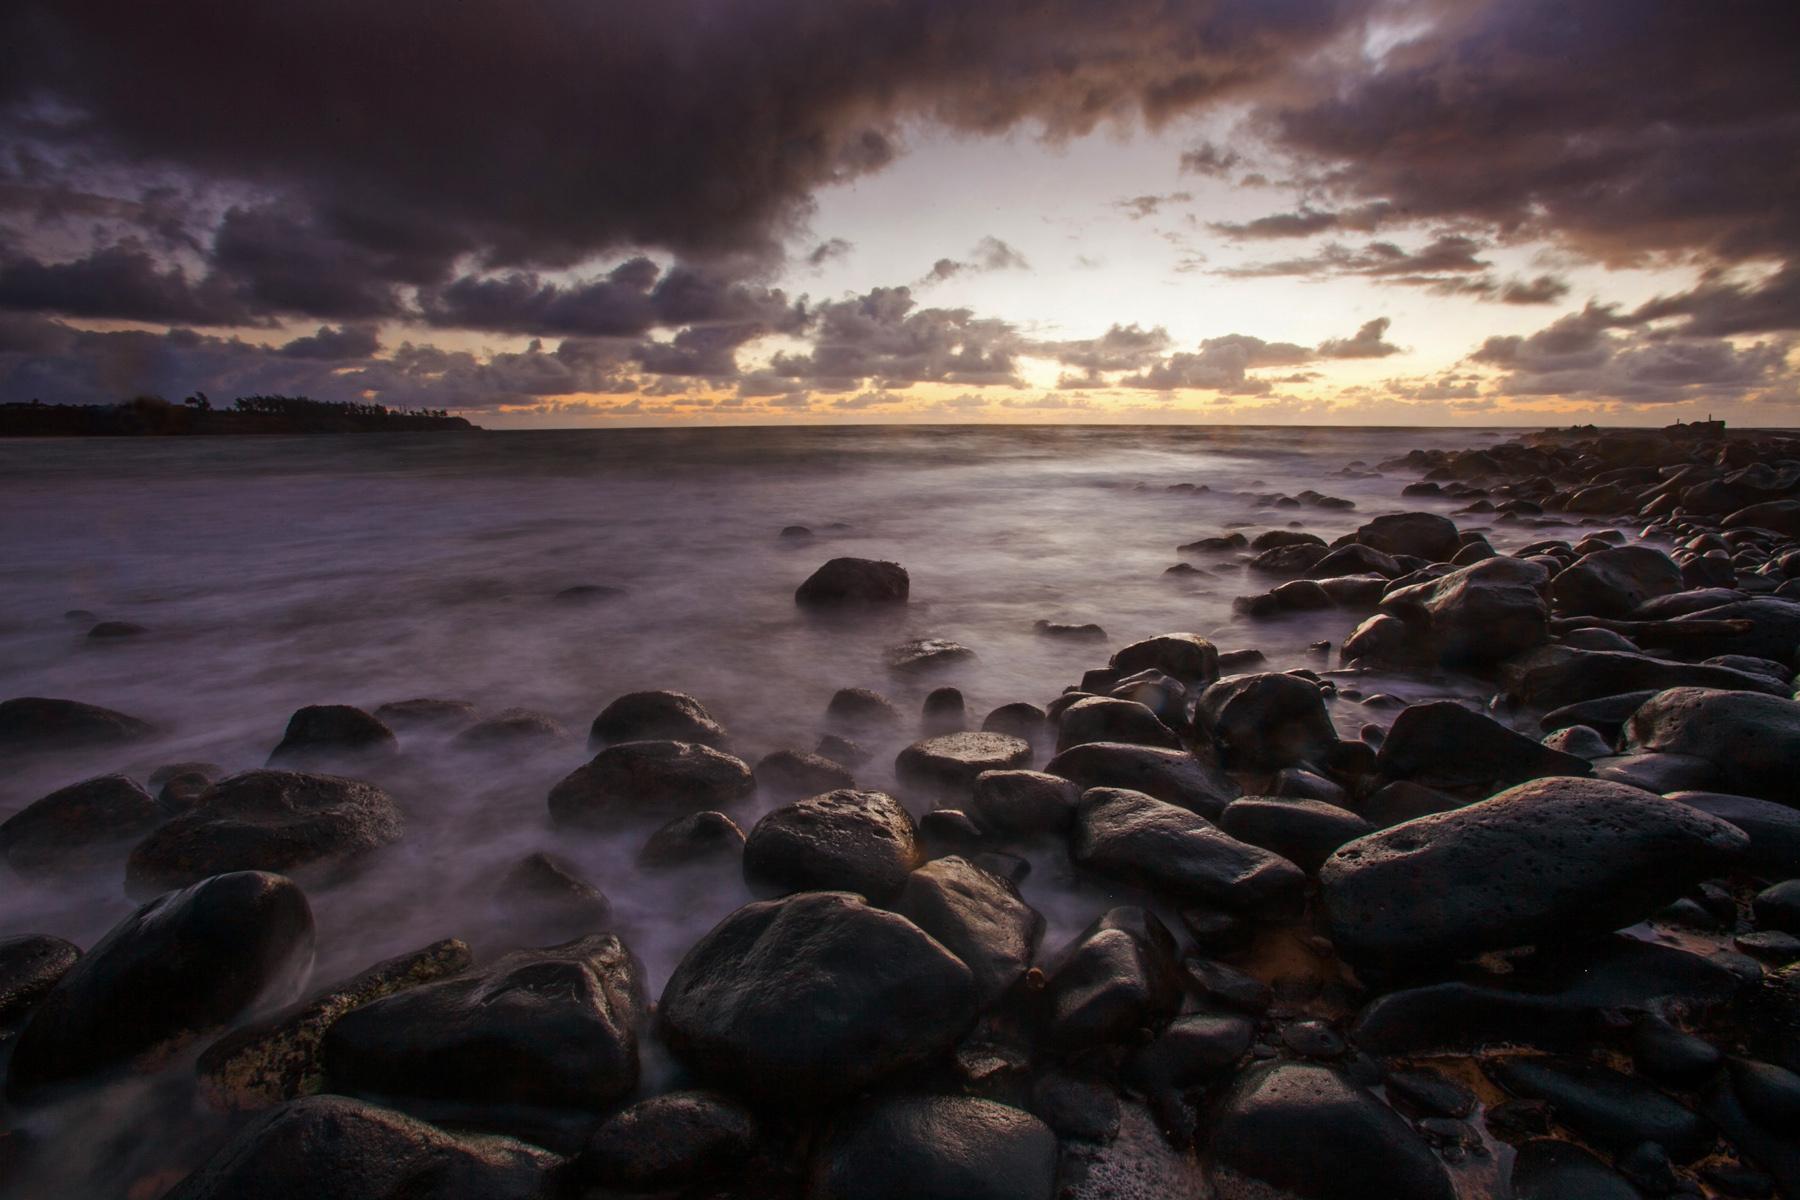 Sunrise in Kapa'a, Kauai